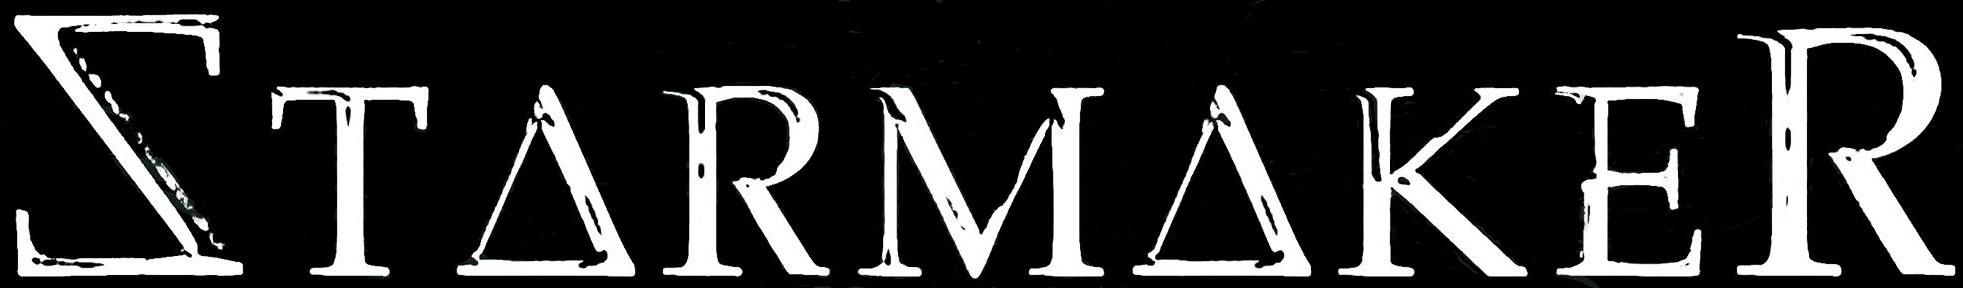 Starmaker - Logo